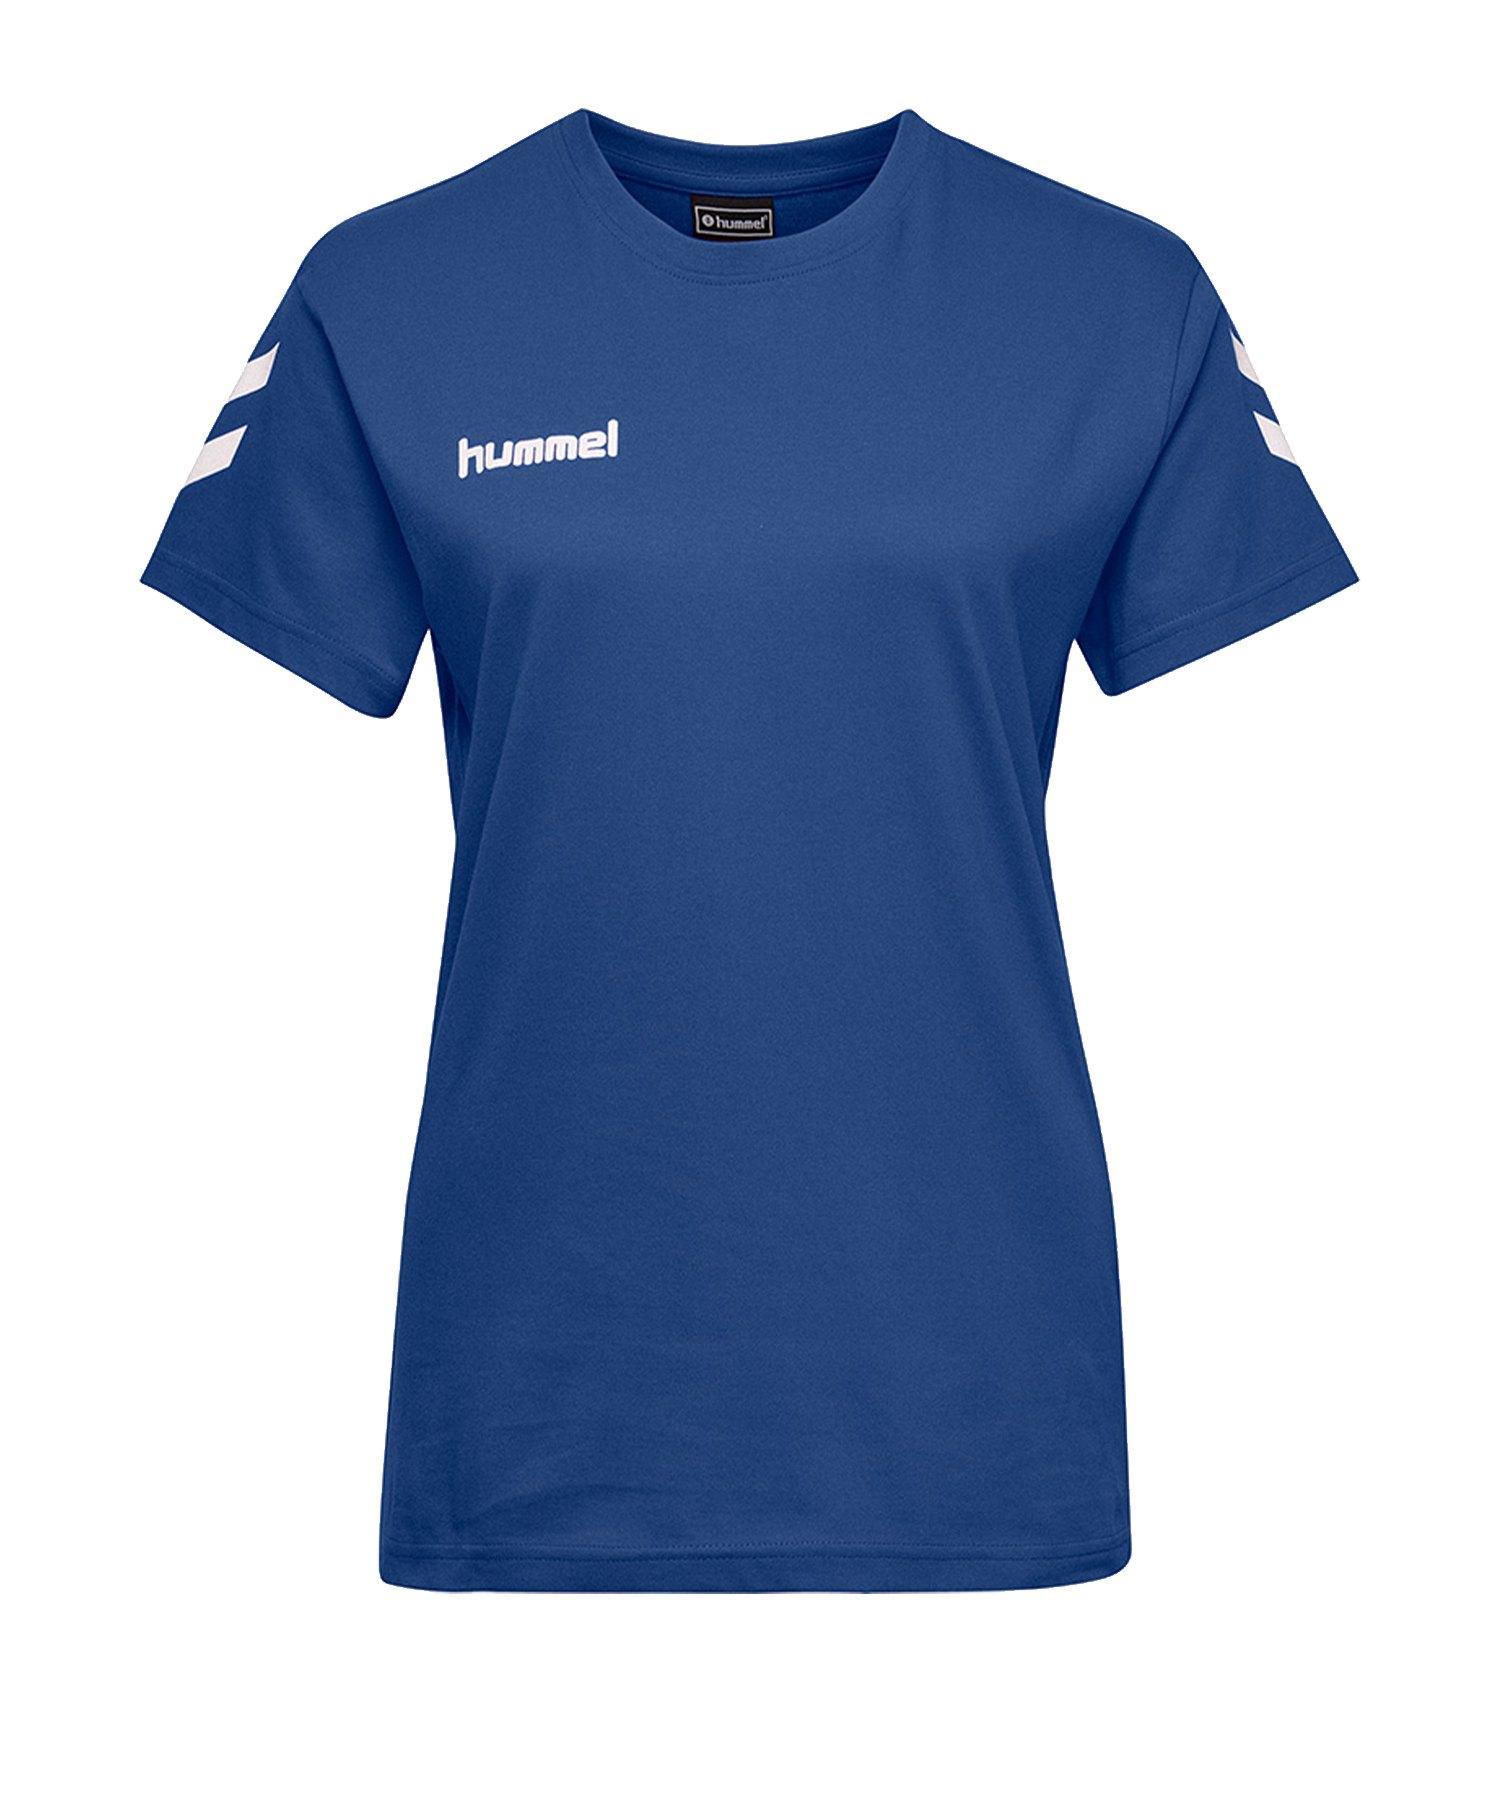 Hummel Cotton T-Shirt Damen Blau F7045 - Blau